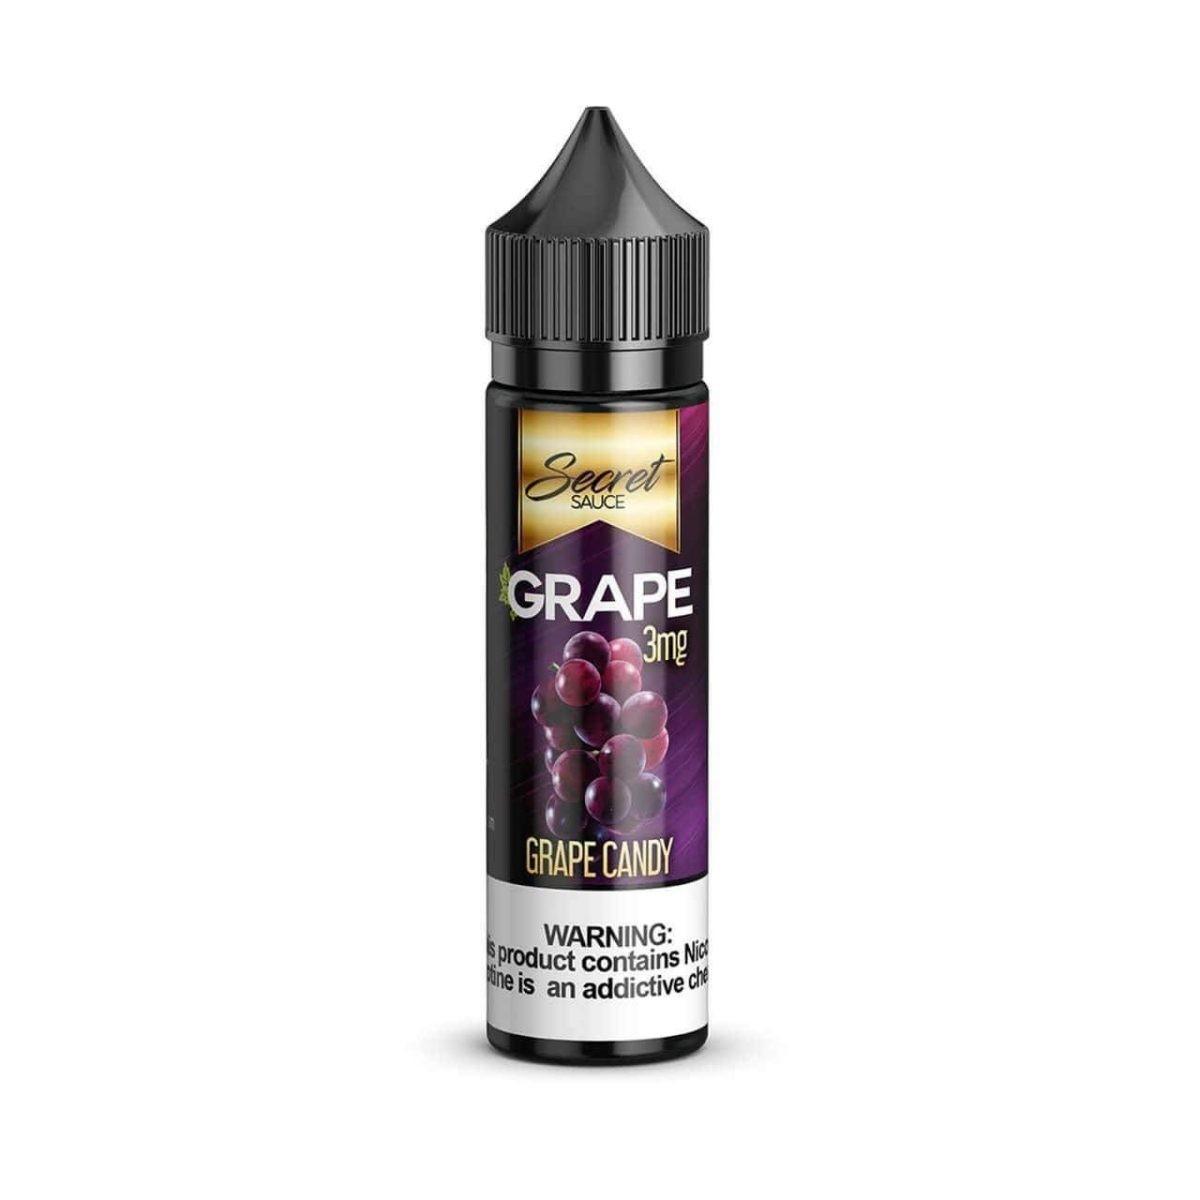 SECRET SAUCE E-LIQUID – GRAPE – 60ML